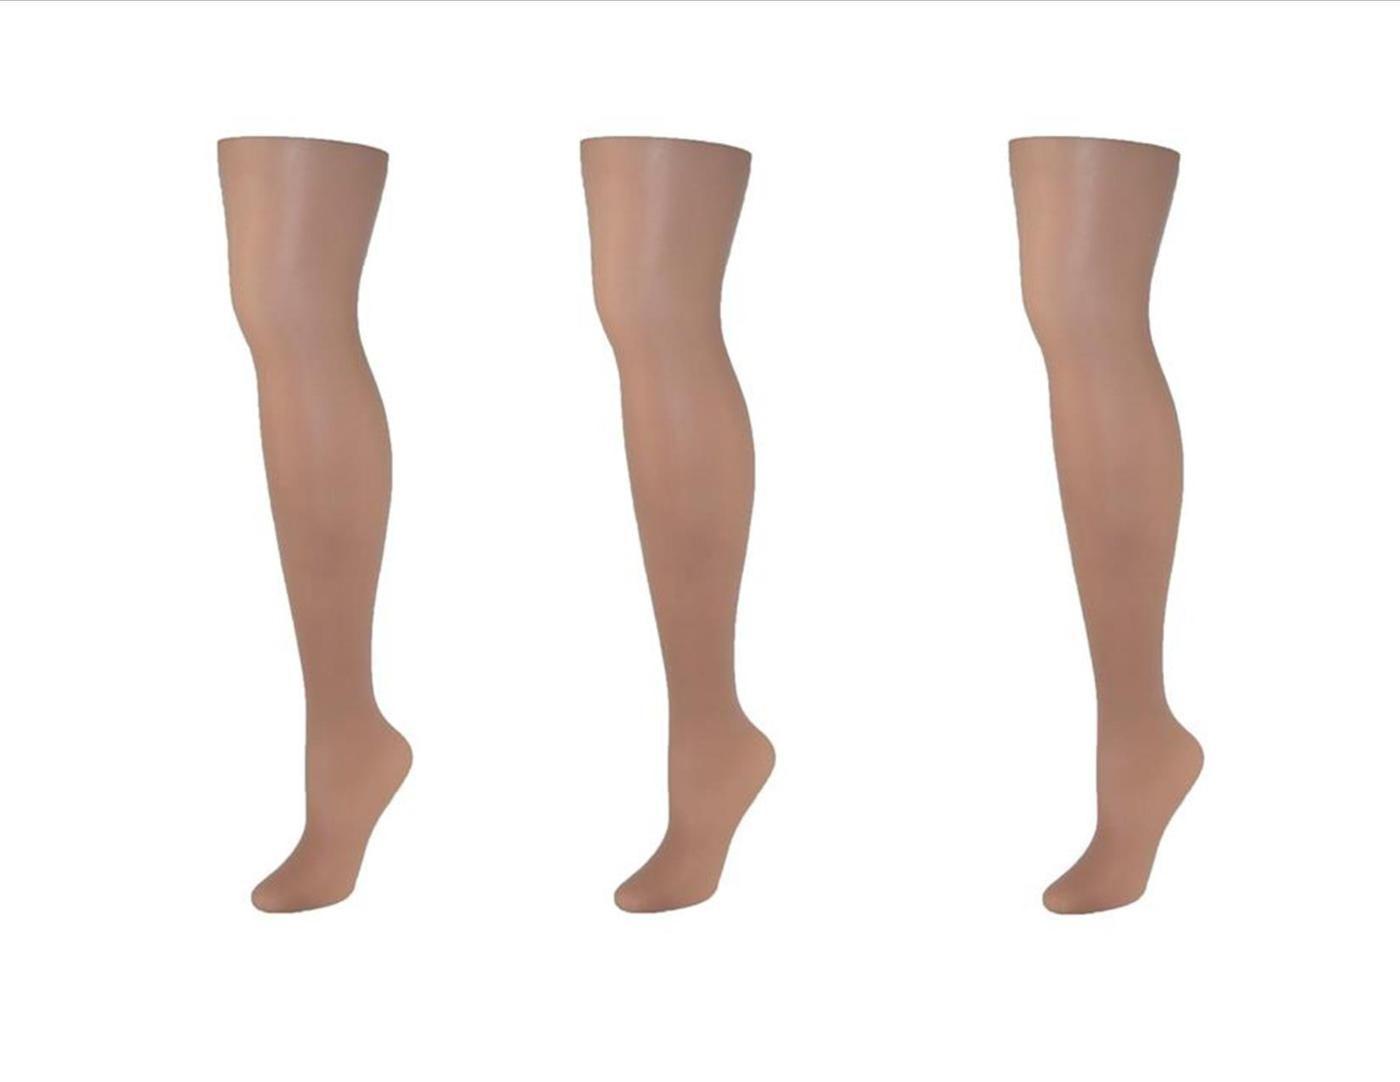 Just My Size Women/'s Plus Run Resistant Control Top Panty Hose